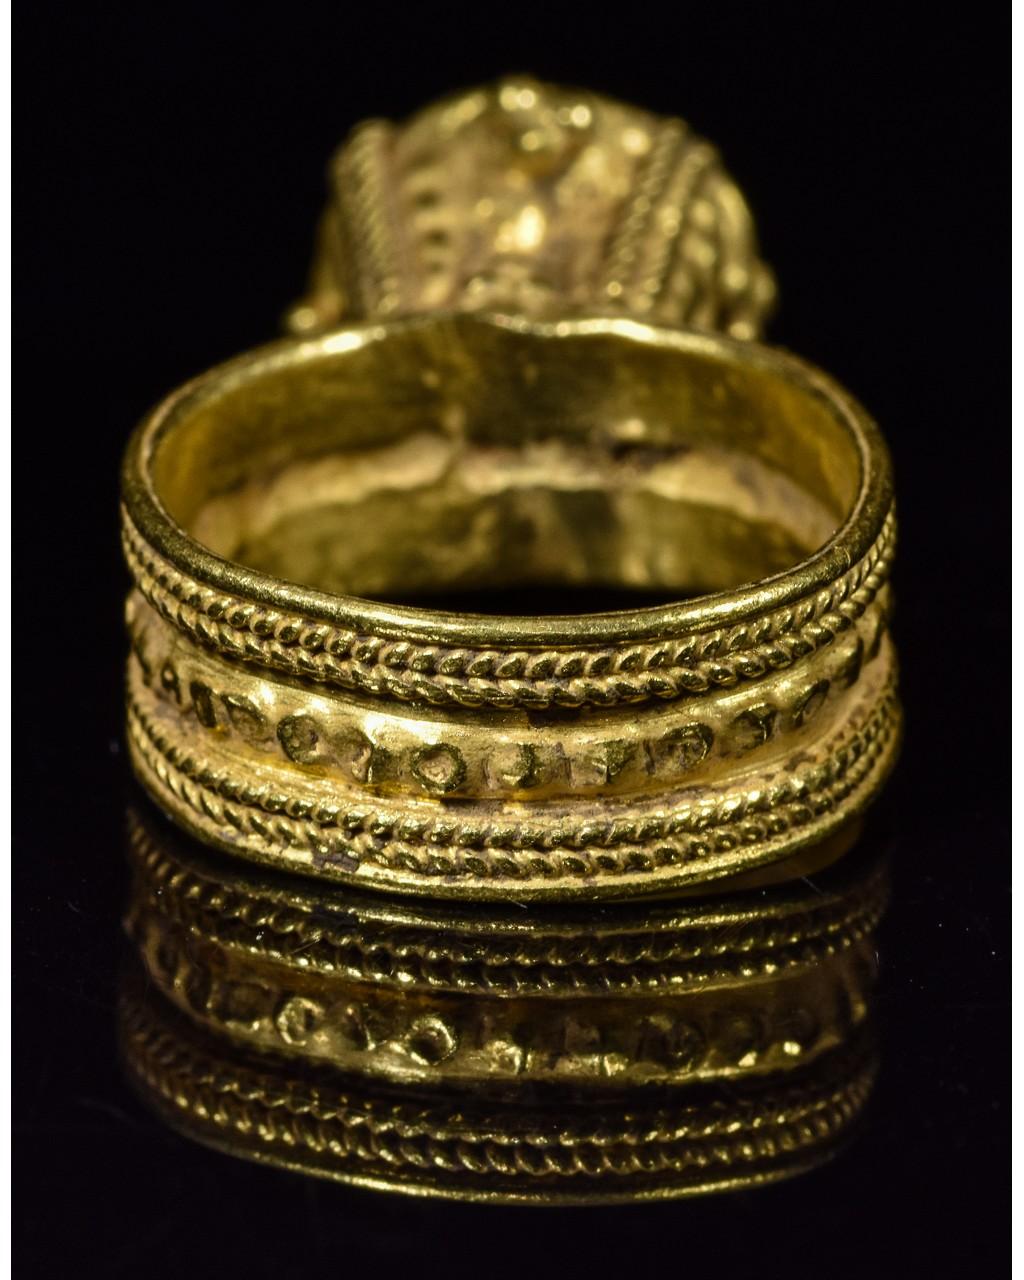 MEROVINGIAN GOLD RING WITH GARNET STONE - Image 4 of 5